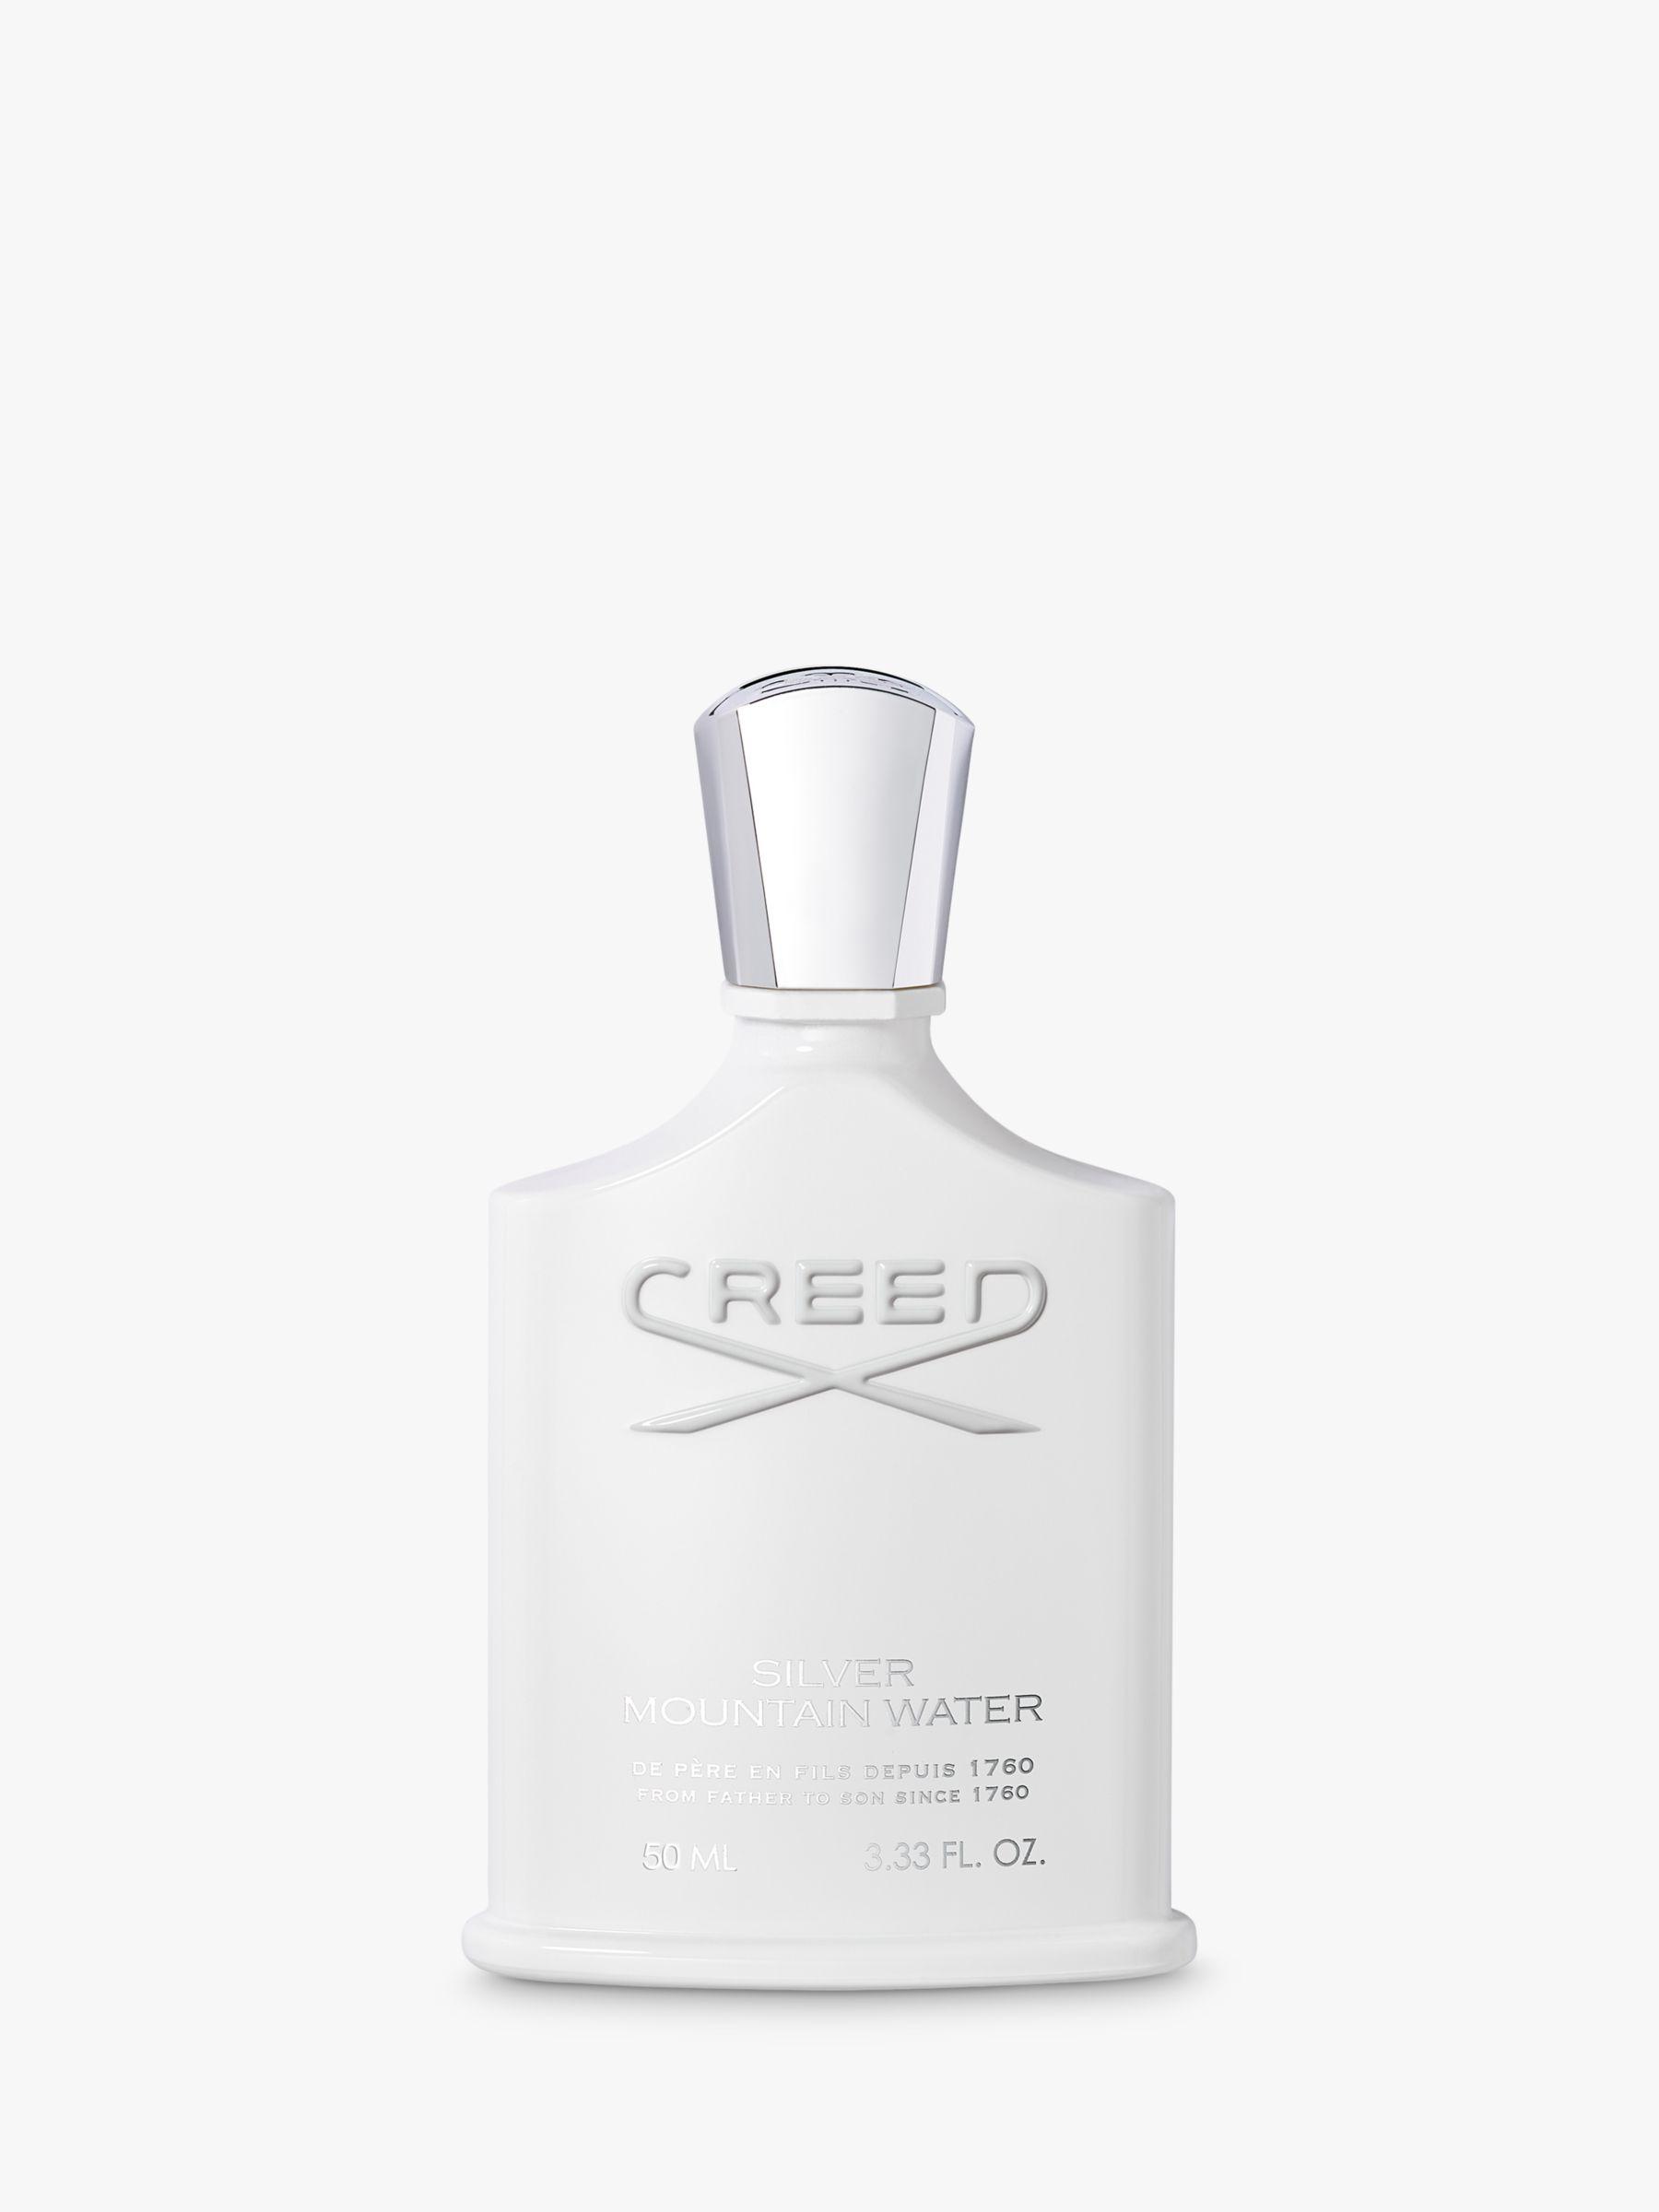 Creed CREED Silver Mountain Water Eau de Parfum, 50ml